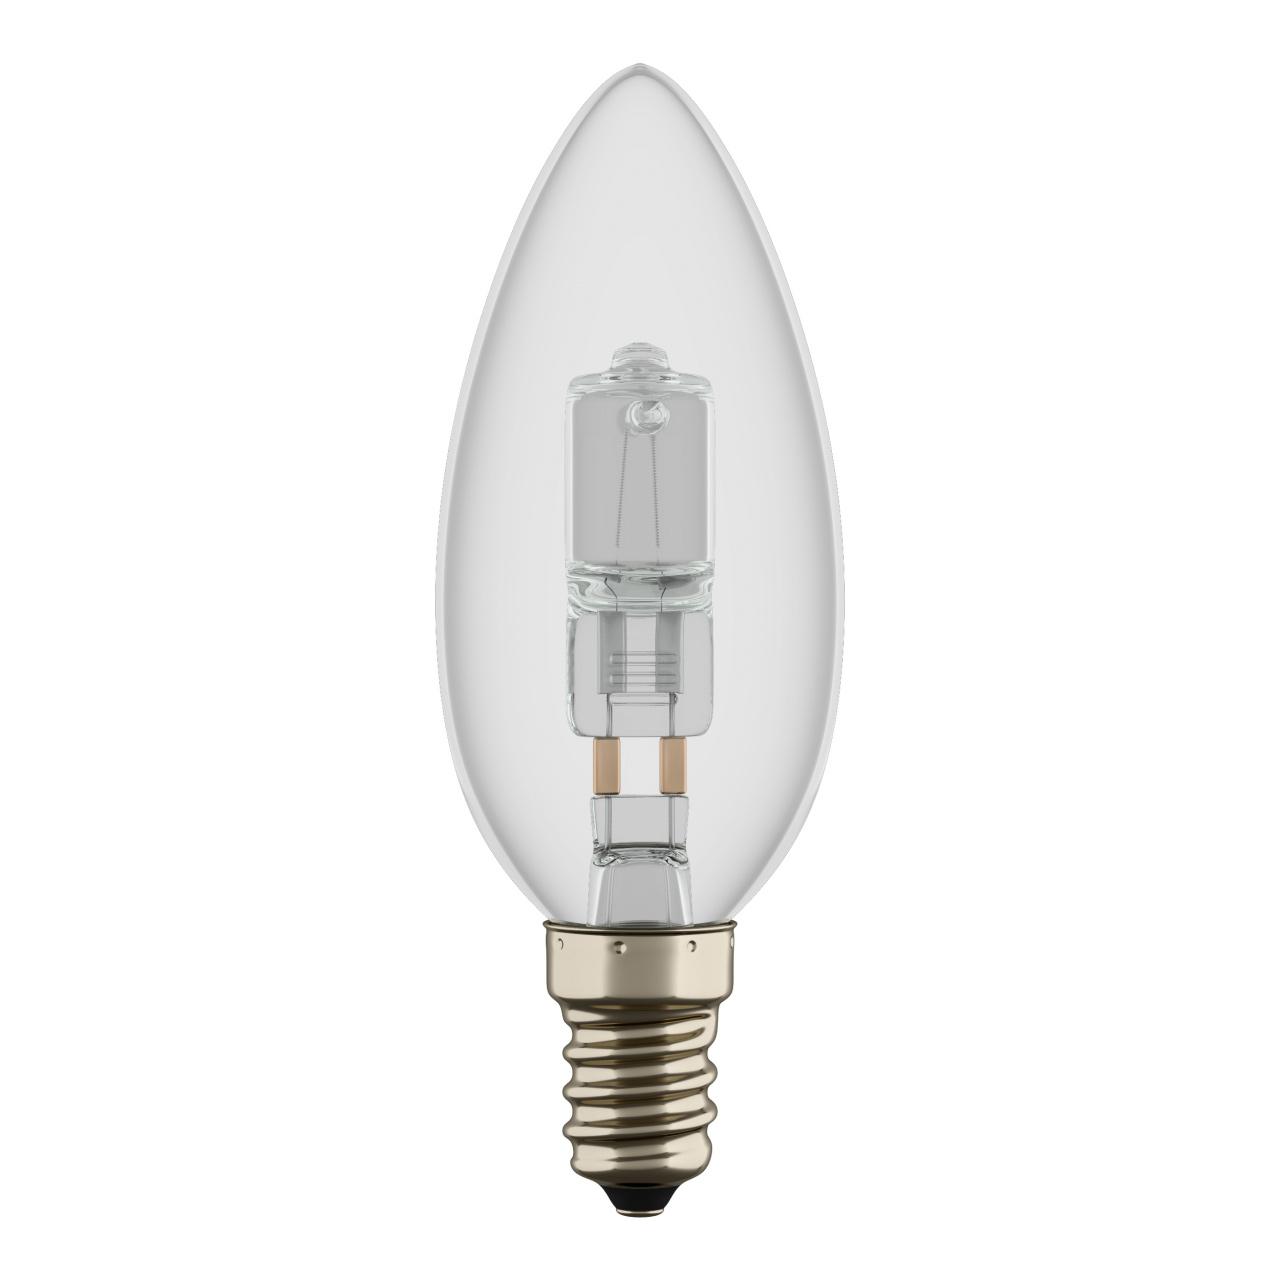 Лампа HAL 220V C35 E14 42W=60W ES RA100 2800K 2000H DIMM Lightstar 922960